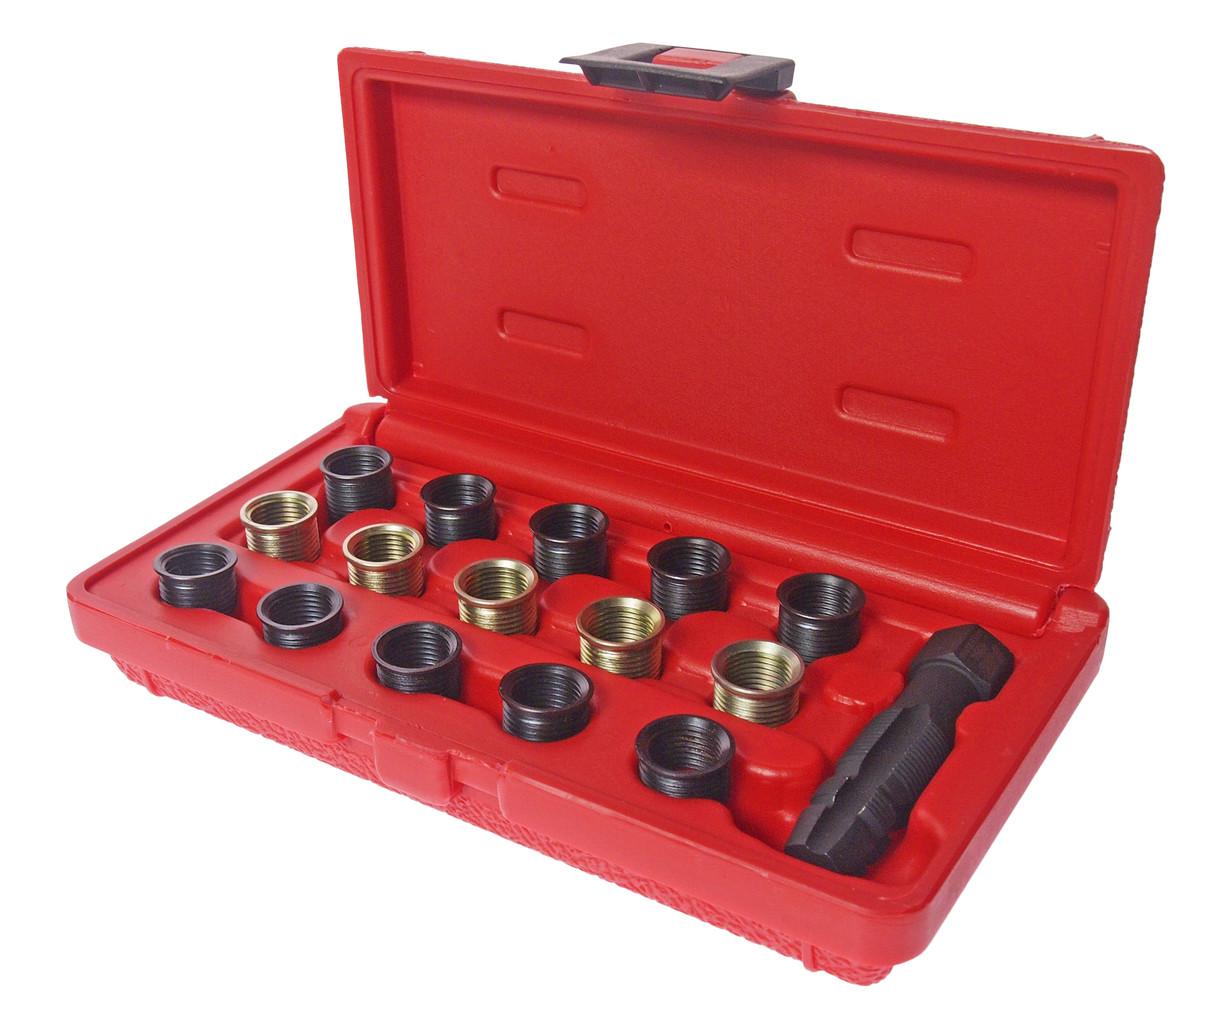 JTC Набор инструментов для восстановления резьбы свечей зажигания (втулки М14х1.25 L=11.2мм,17.5мм) JTC